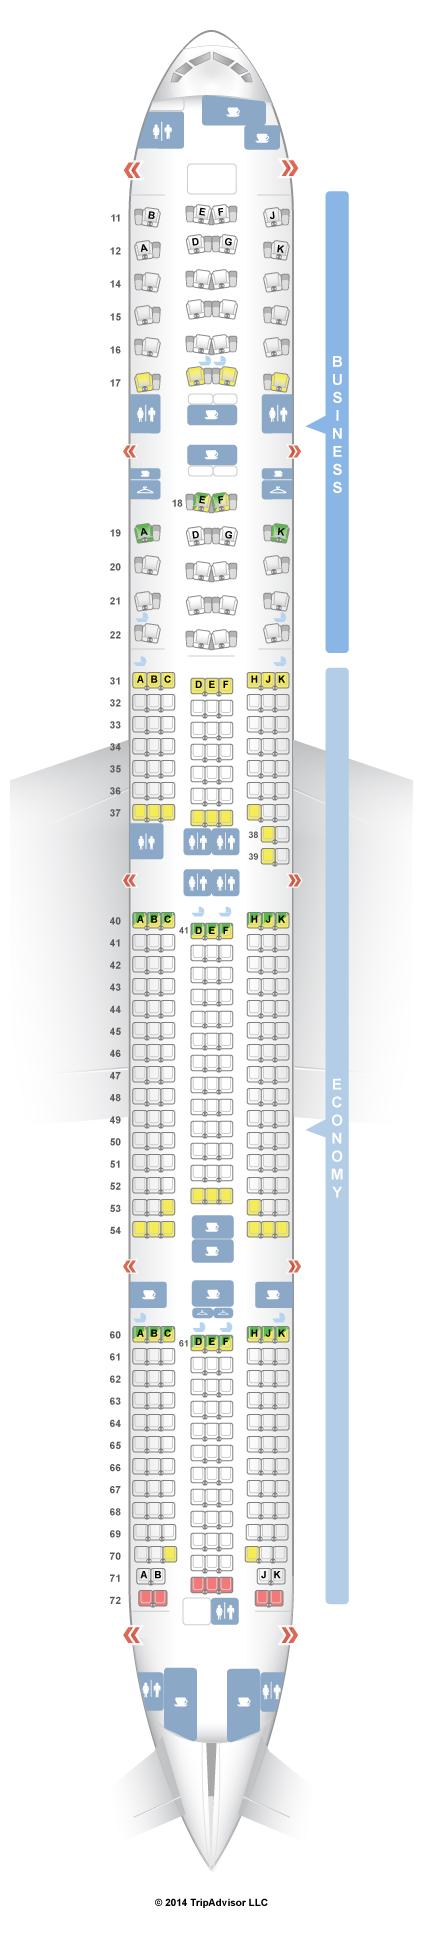 SeatGuru Seat Map THAI Boeing 777-300ER (77W) | Flugzeug